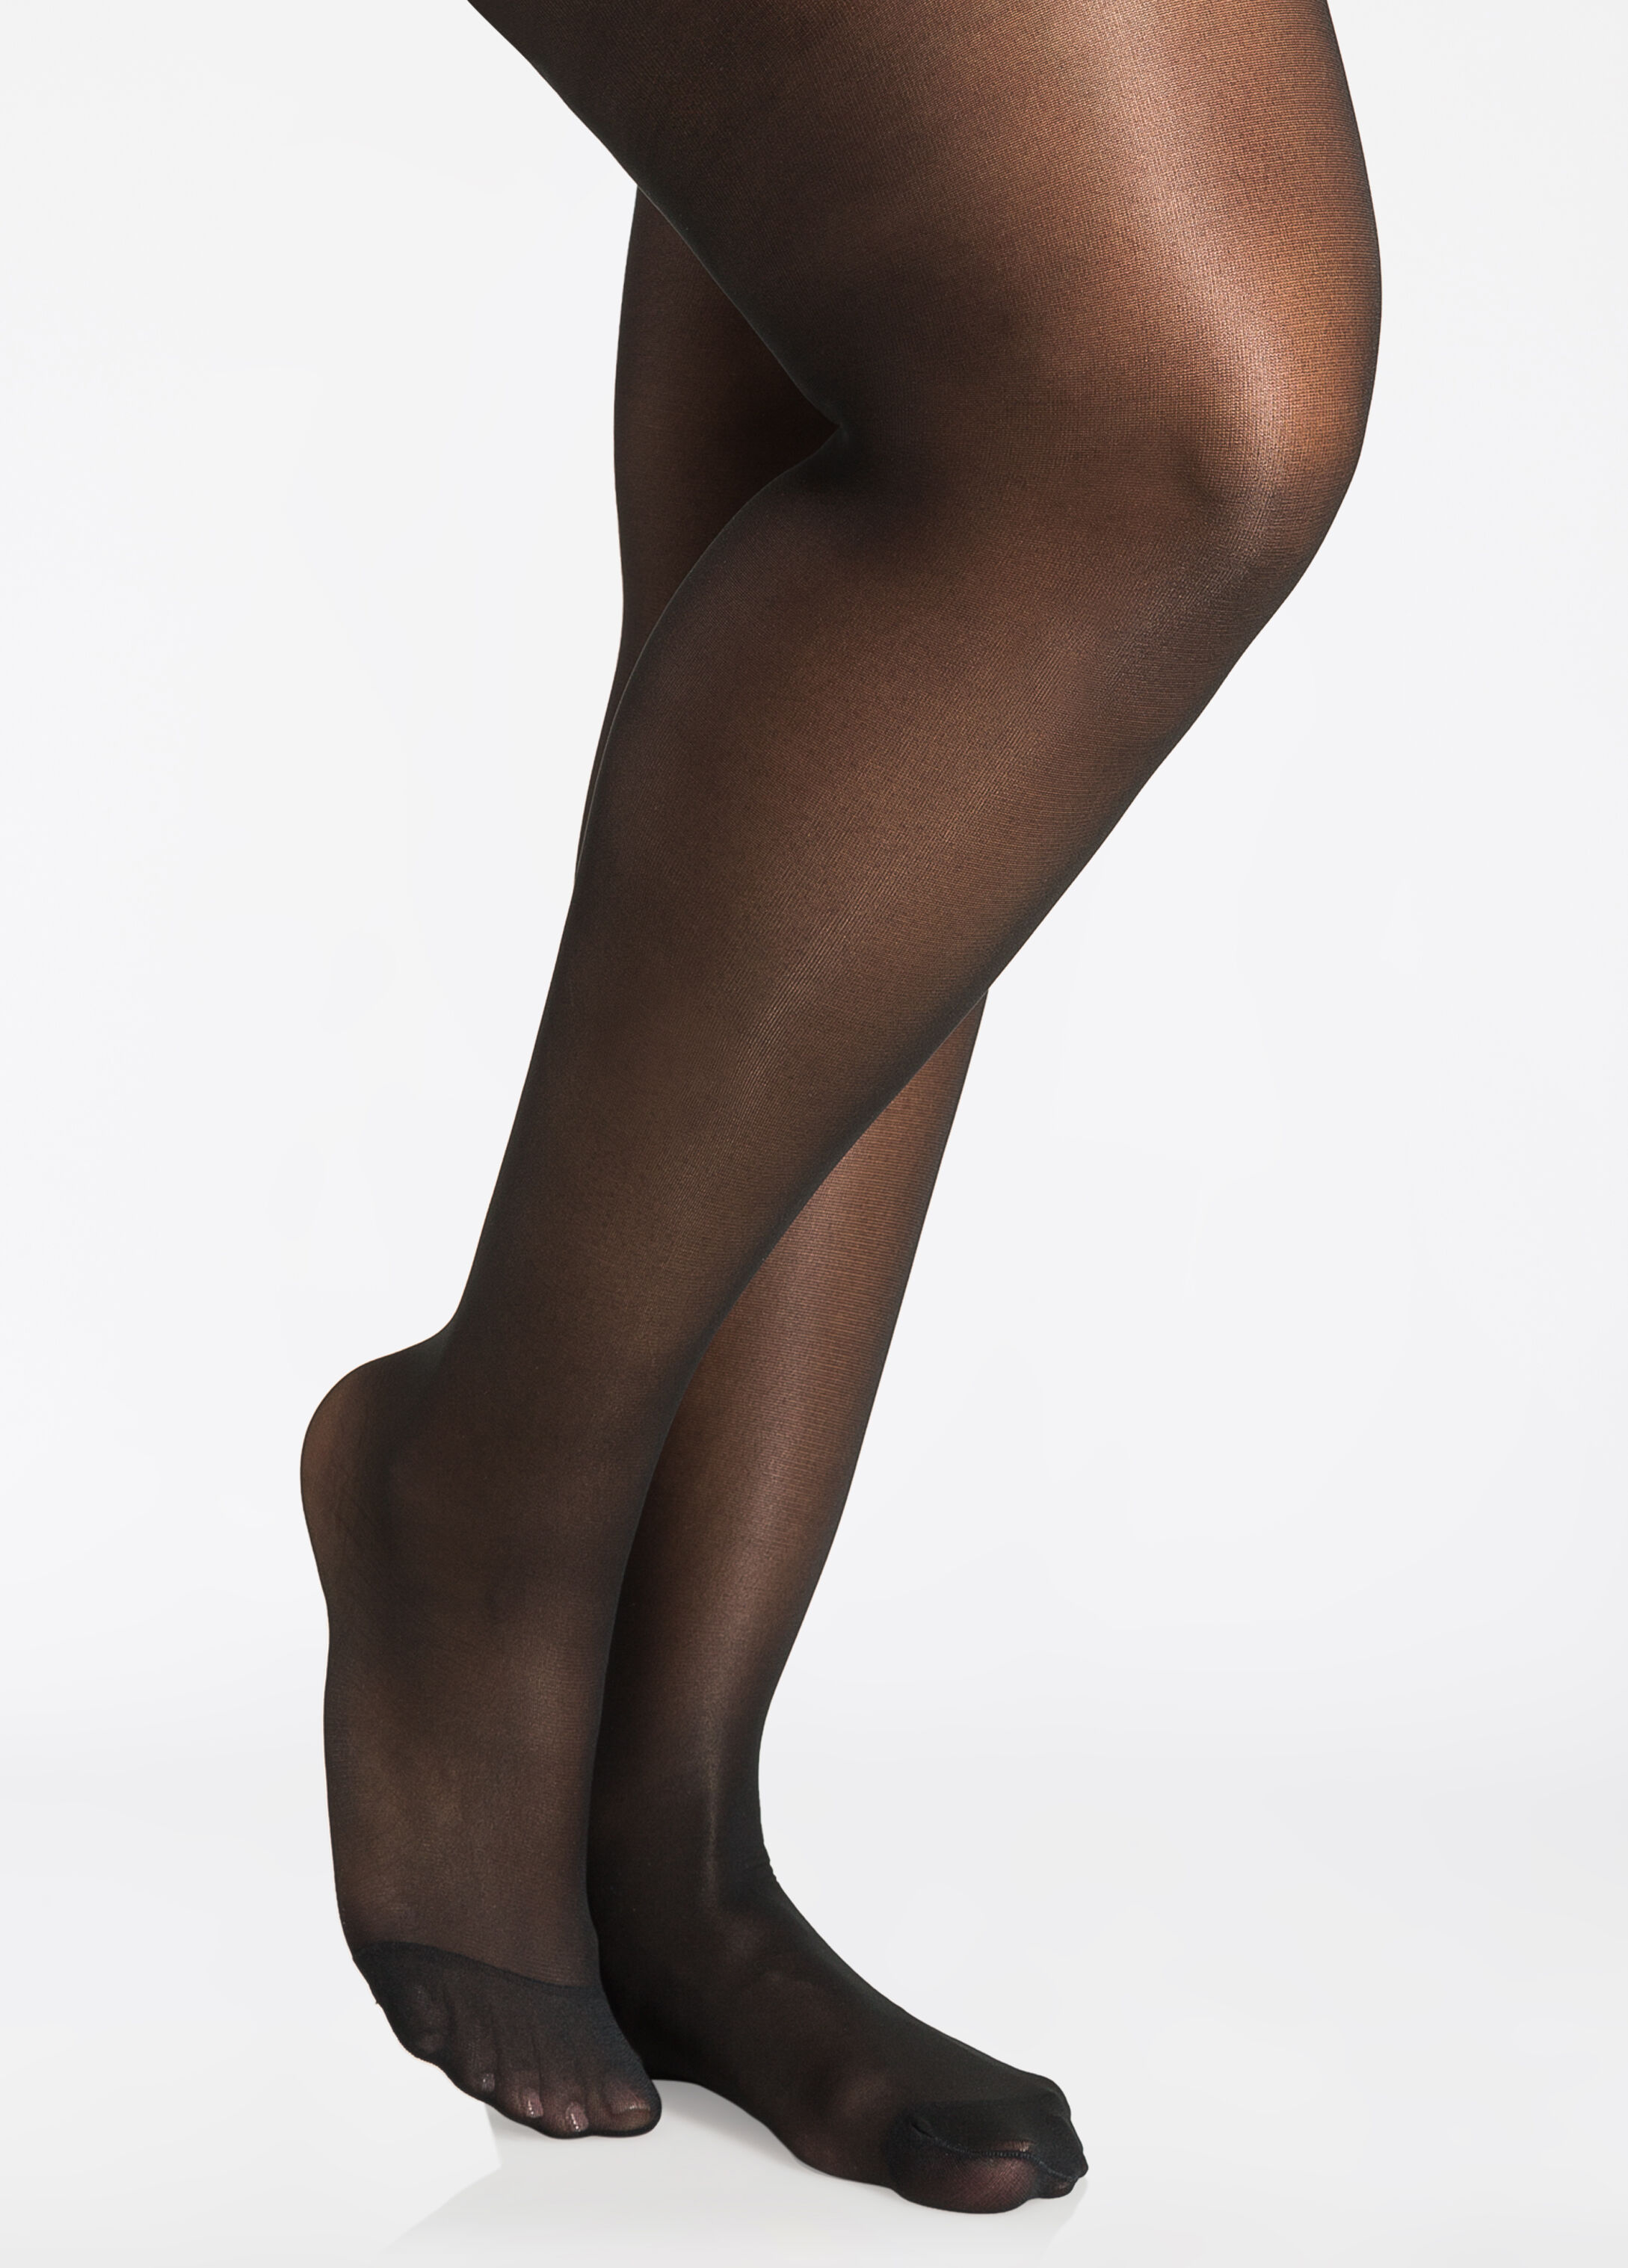 Berkshire Queen Silky Control Top Pantyhose